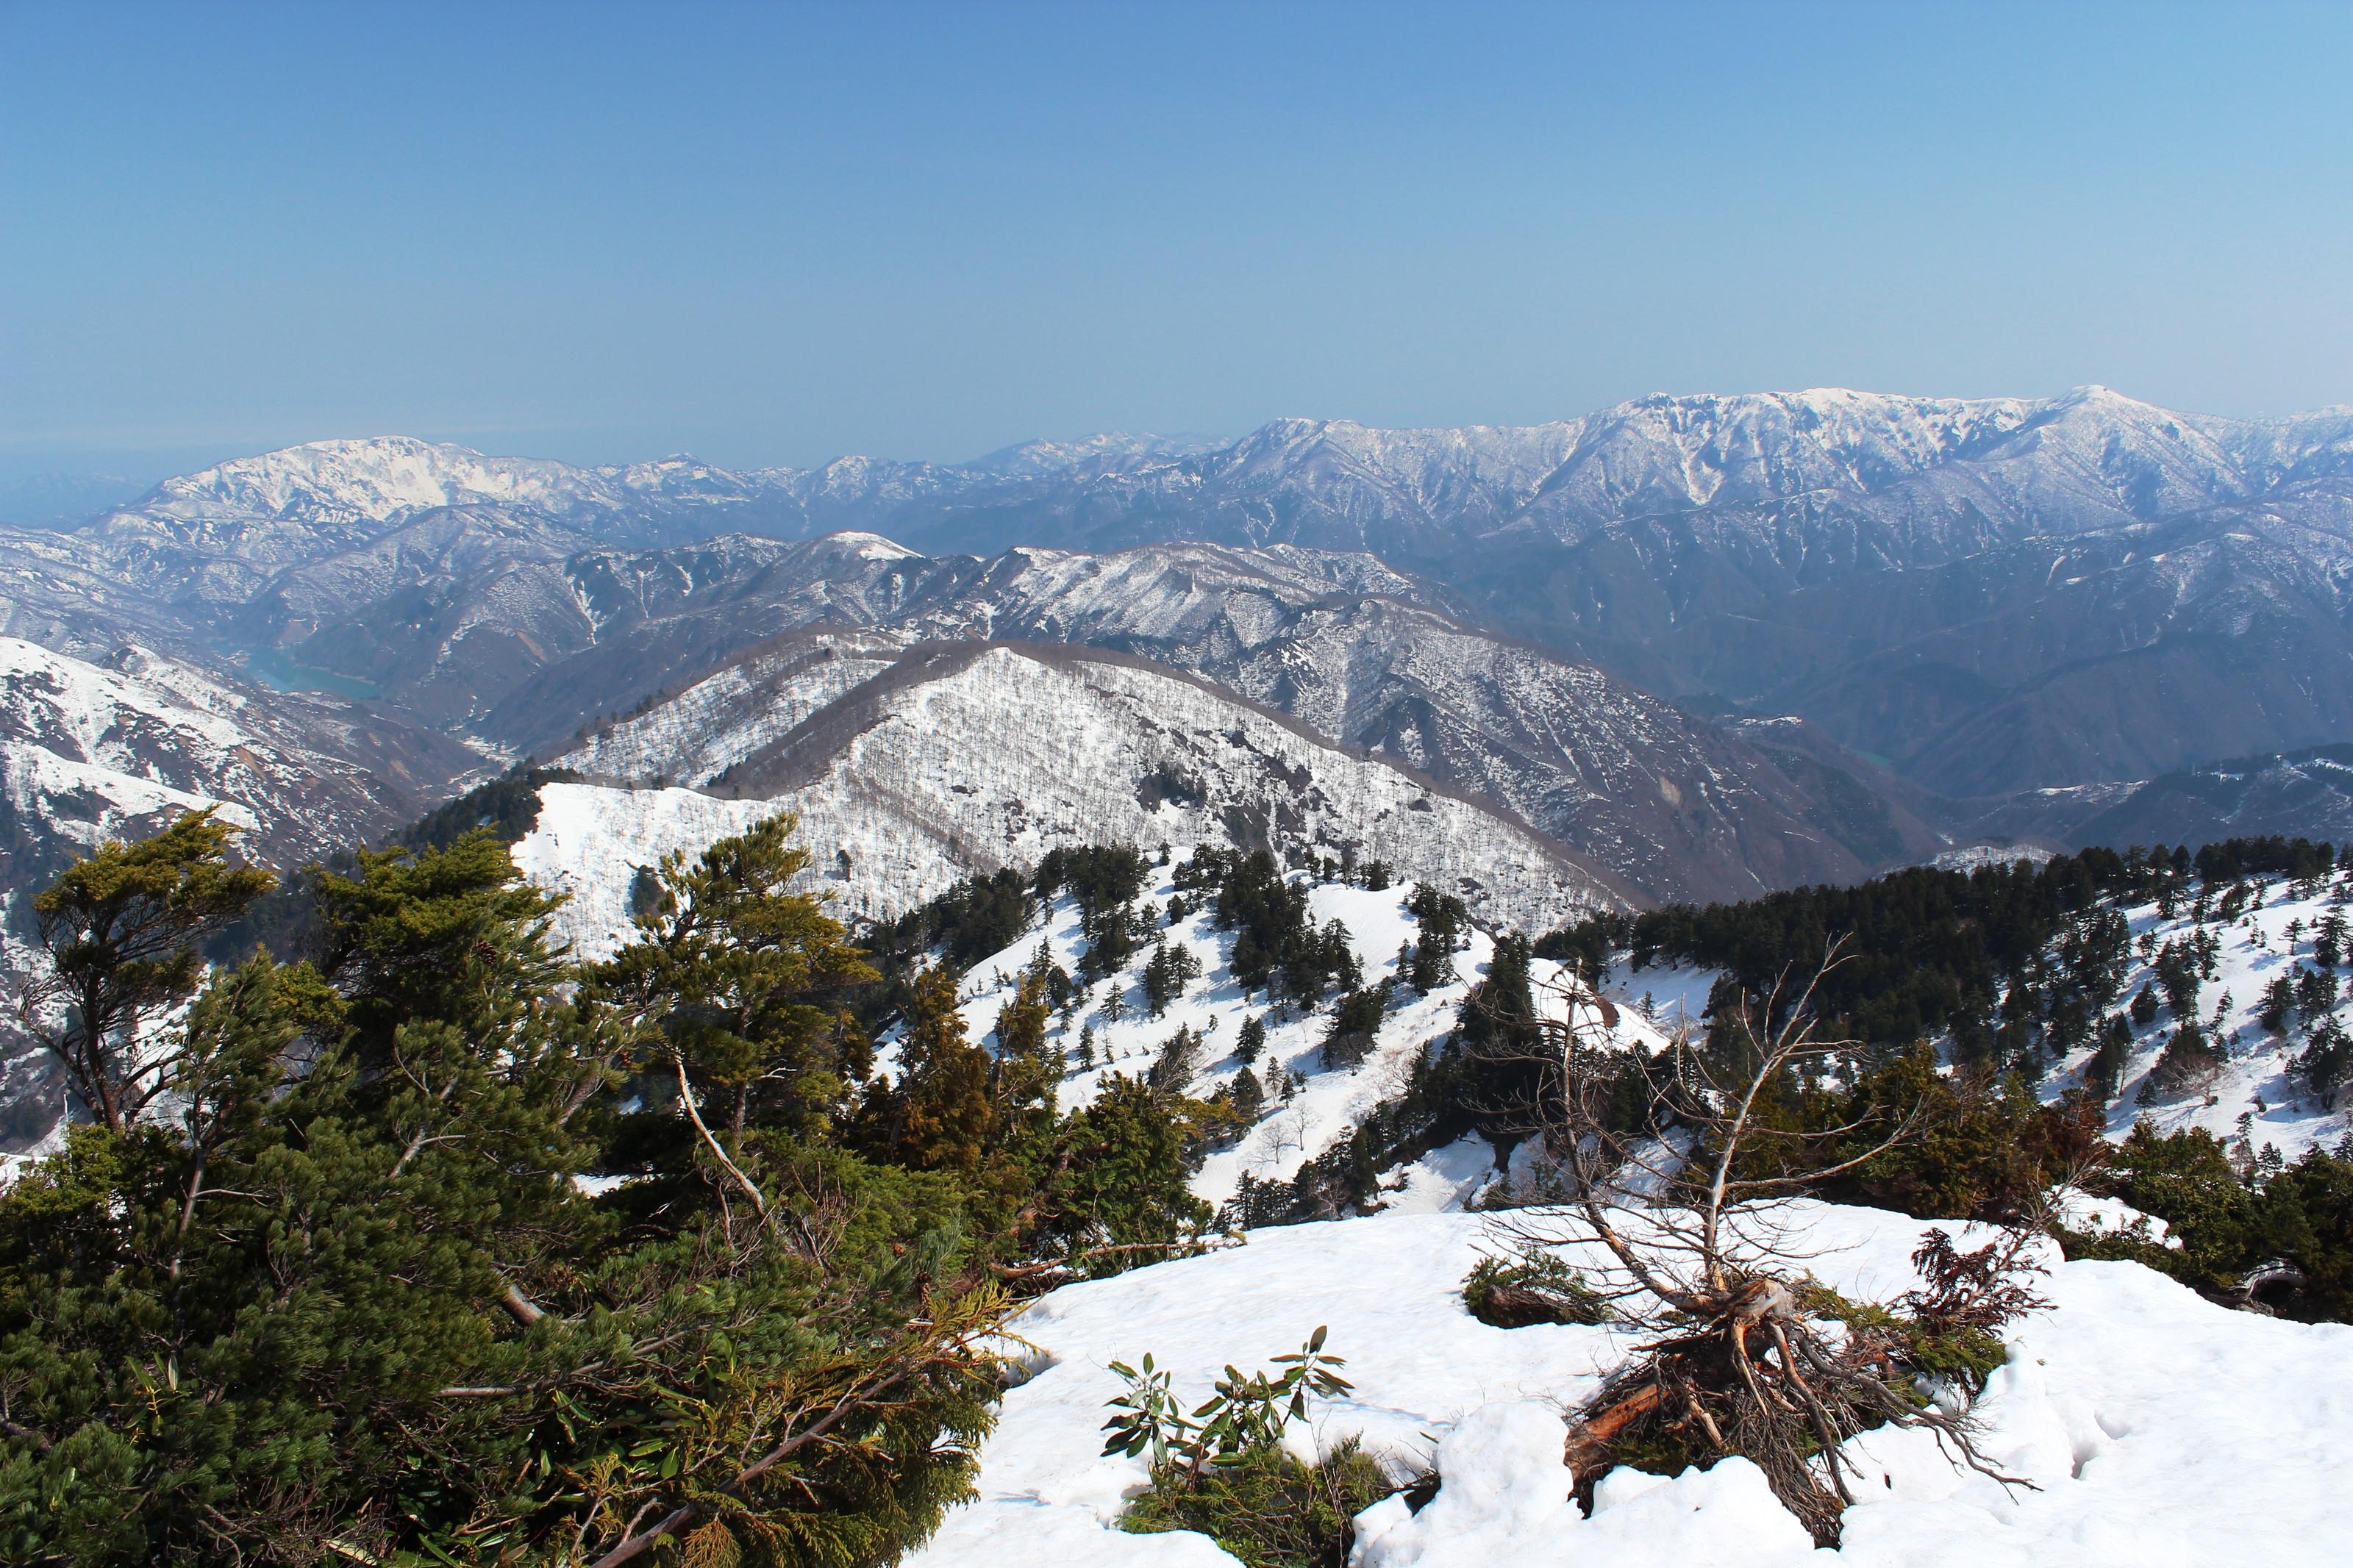 File:Mount Saru and Mount Ningyo from Mount Sanpoiwa.jpg - Wikimedia ...